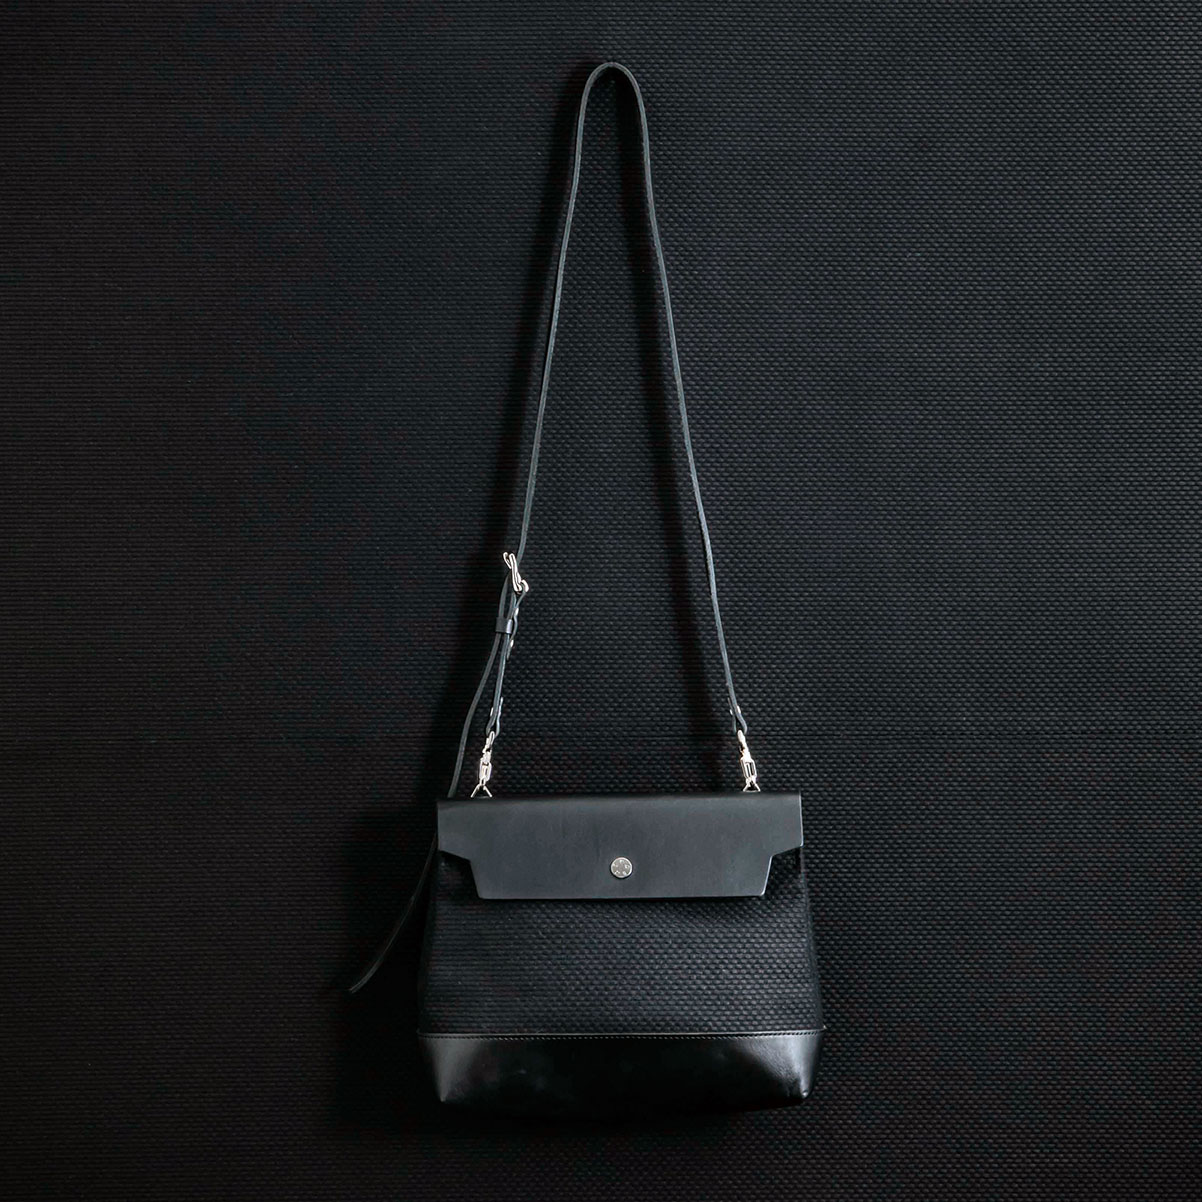 N°60-plus Micro Shoulder medium